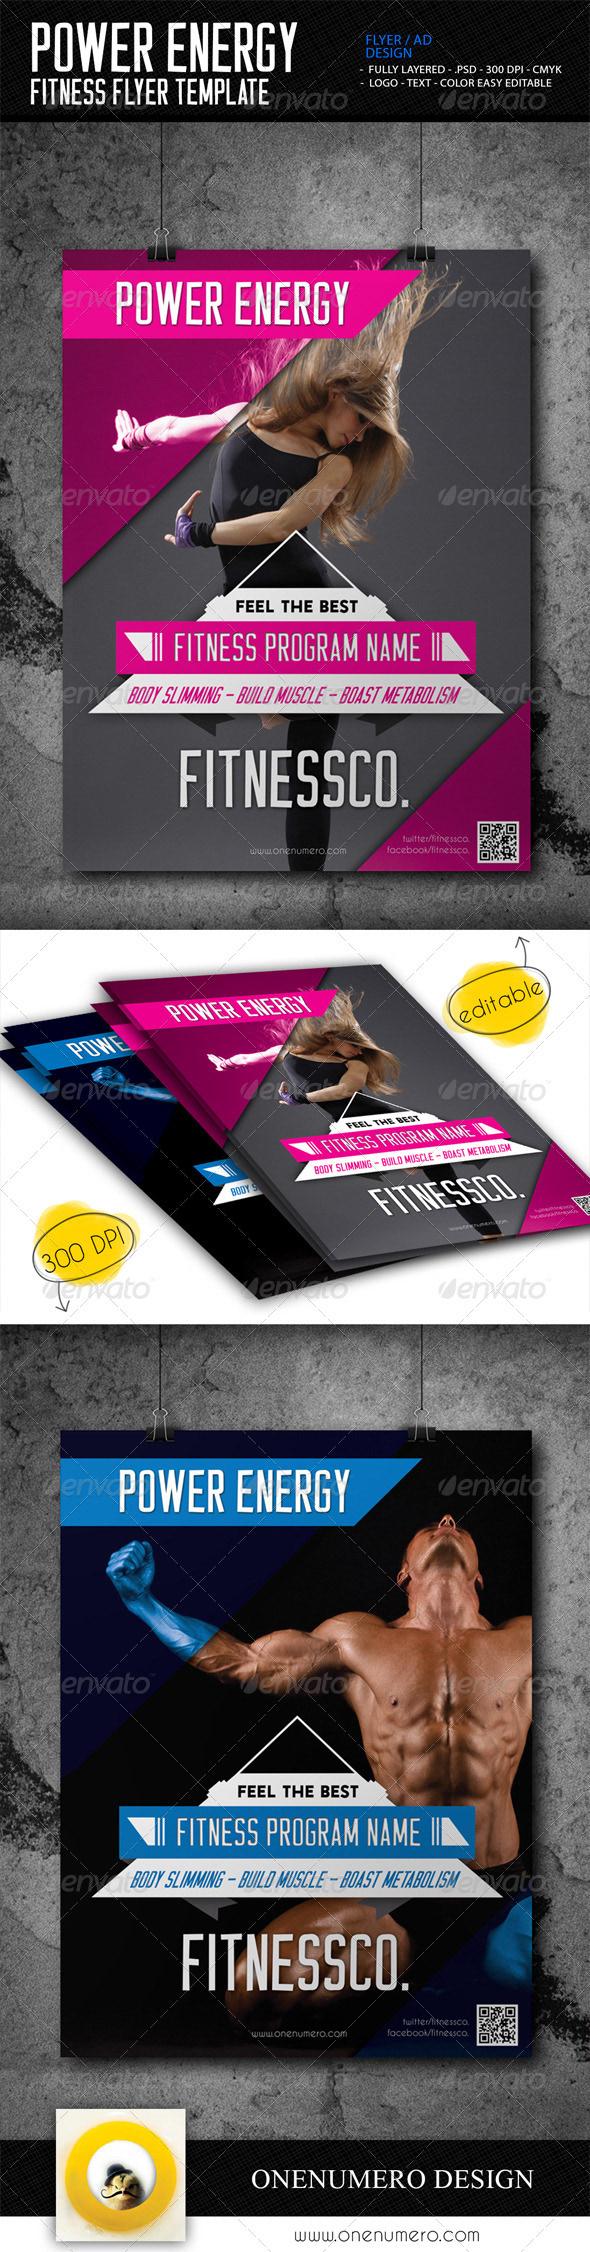 Ersan Mutlu Power Energy Fitness Flyer Template